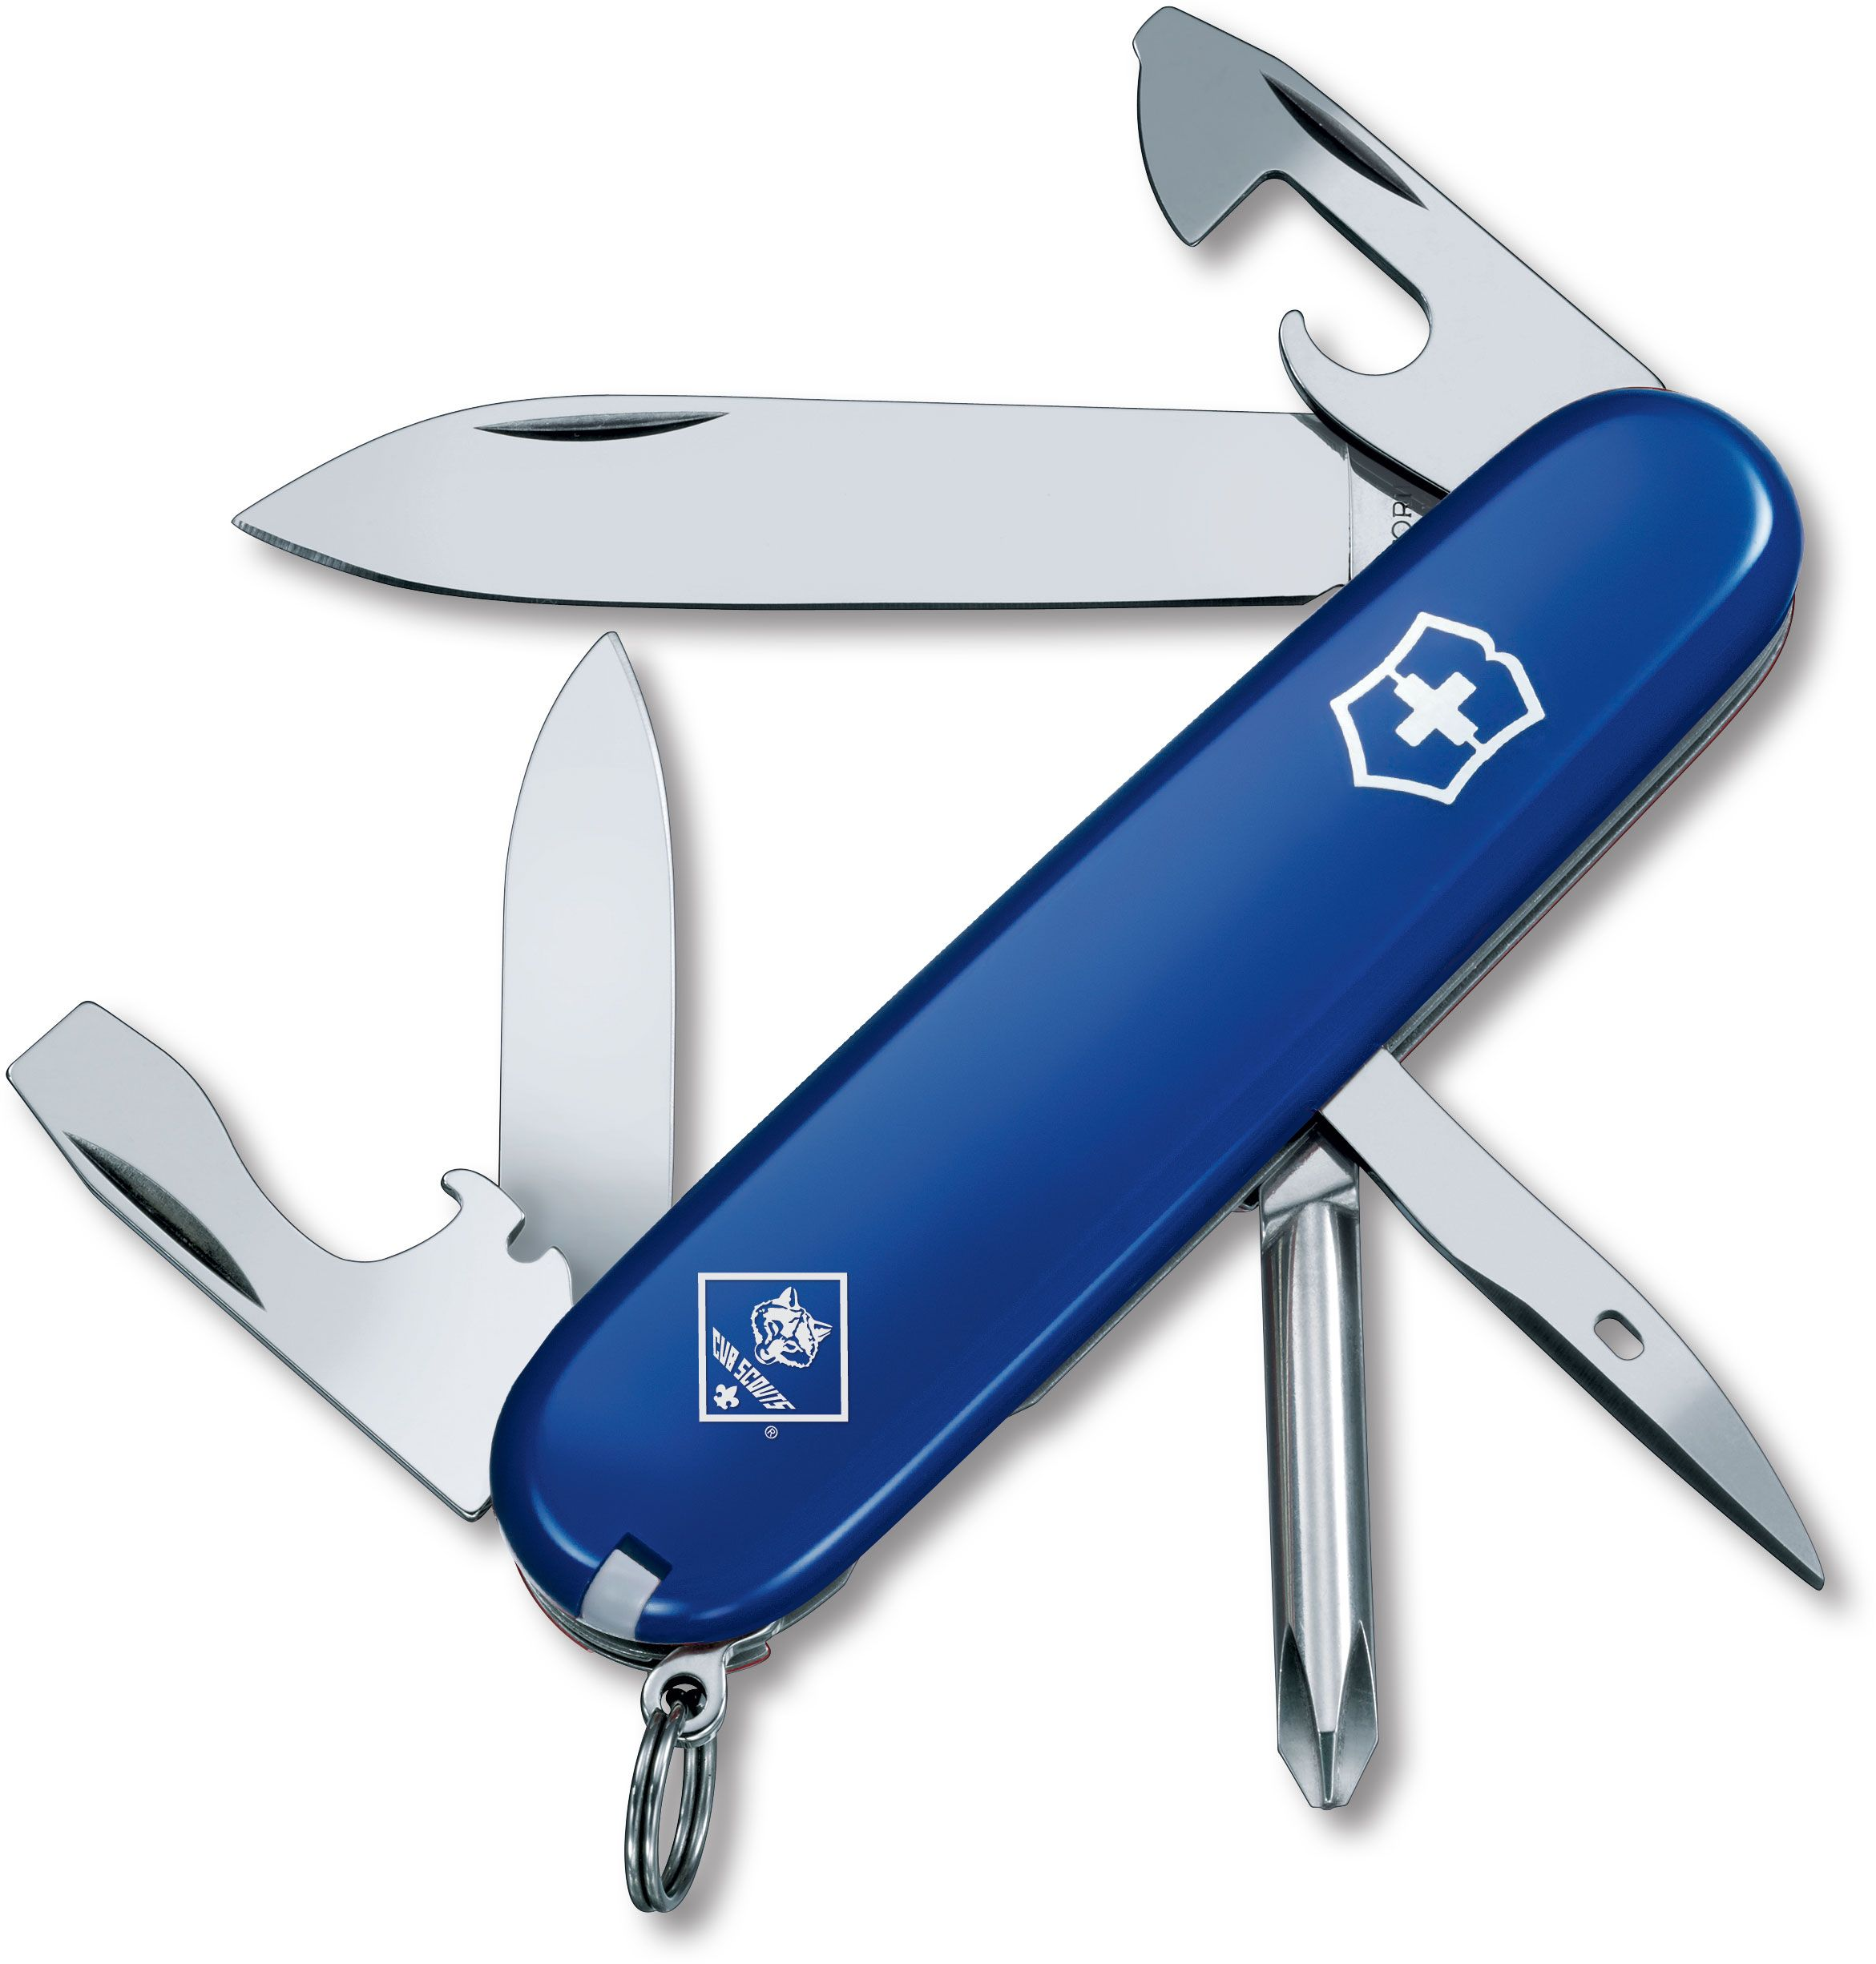 Victorinox Swiss Army Tinker Multi-Tool, Blue, Cub Scout, 3.58 inch Closed